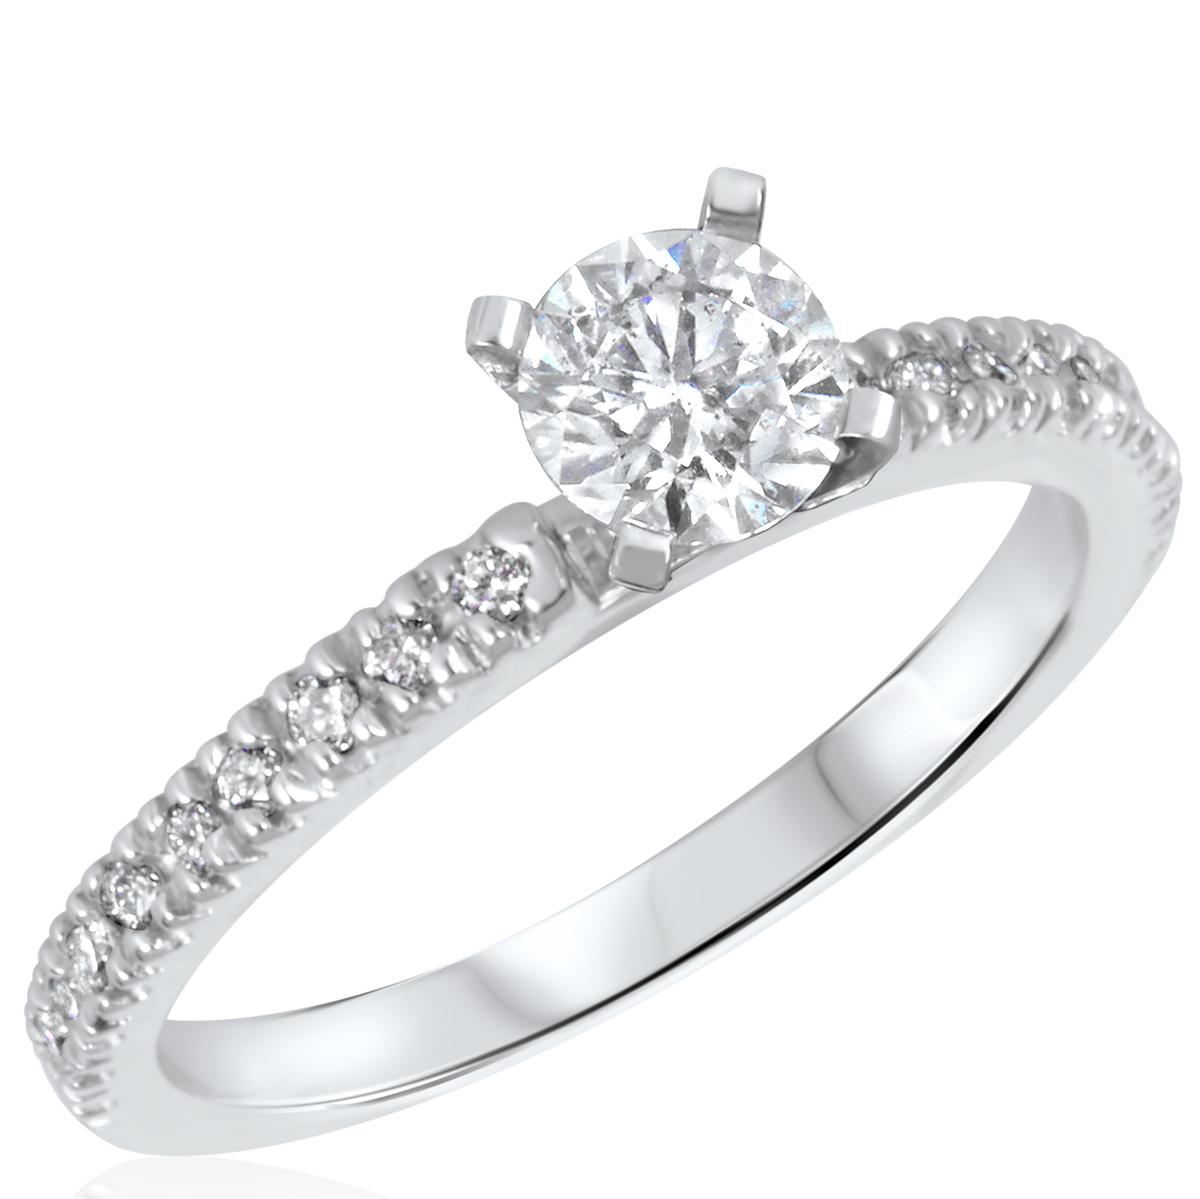 3/4 CT. T.W. Diamond Ladies Engagement Ring 14K White Gold- Size 8